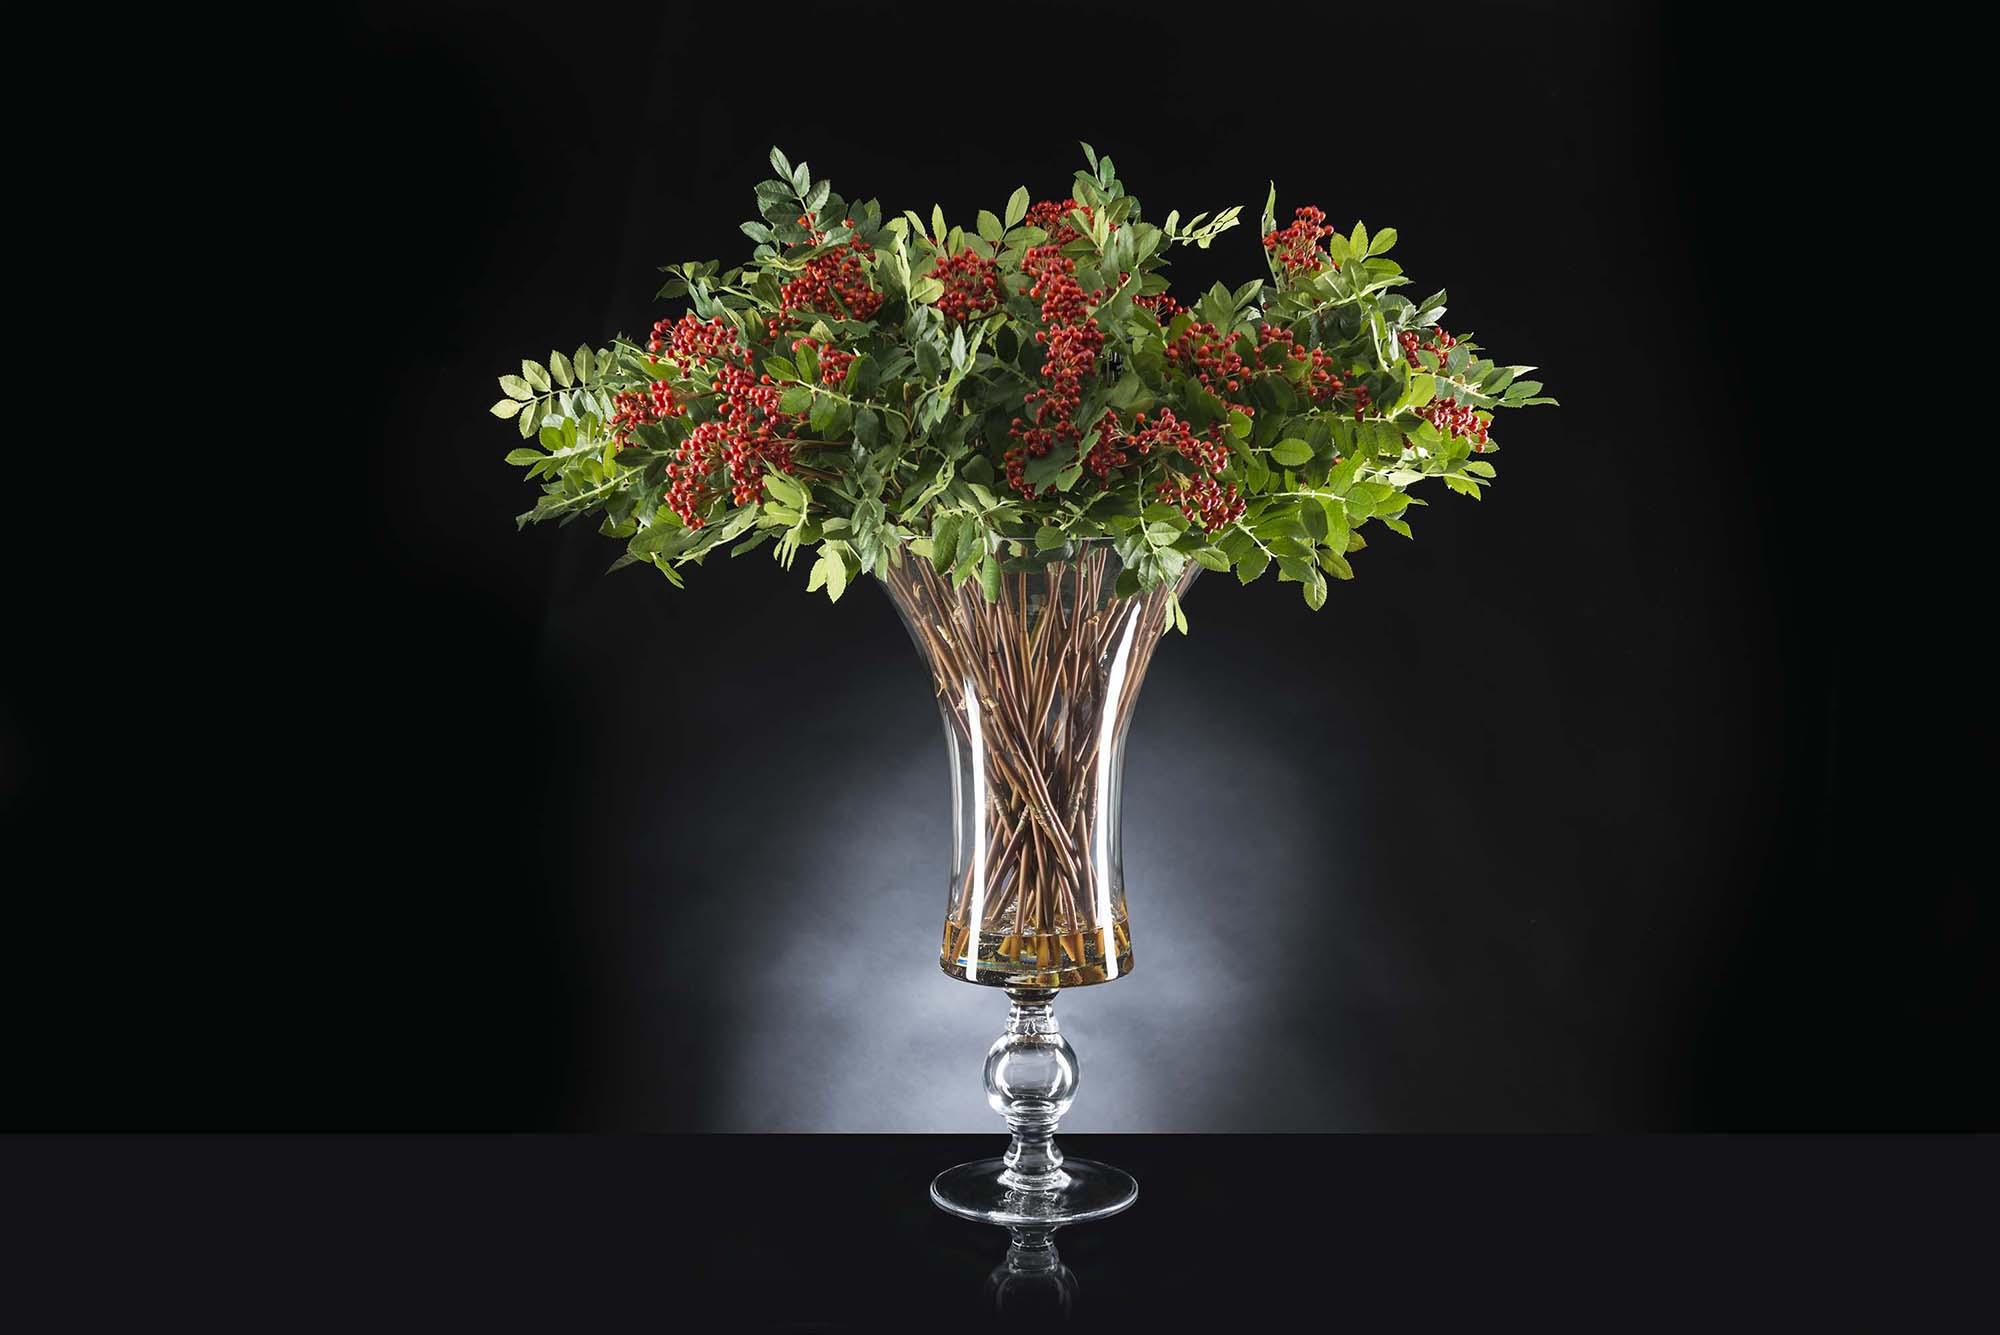 Interiors Advent Calendar - VG New Trend Eternity Bowl Red Berries via Masha Shapiro Agency UK.jpg